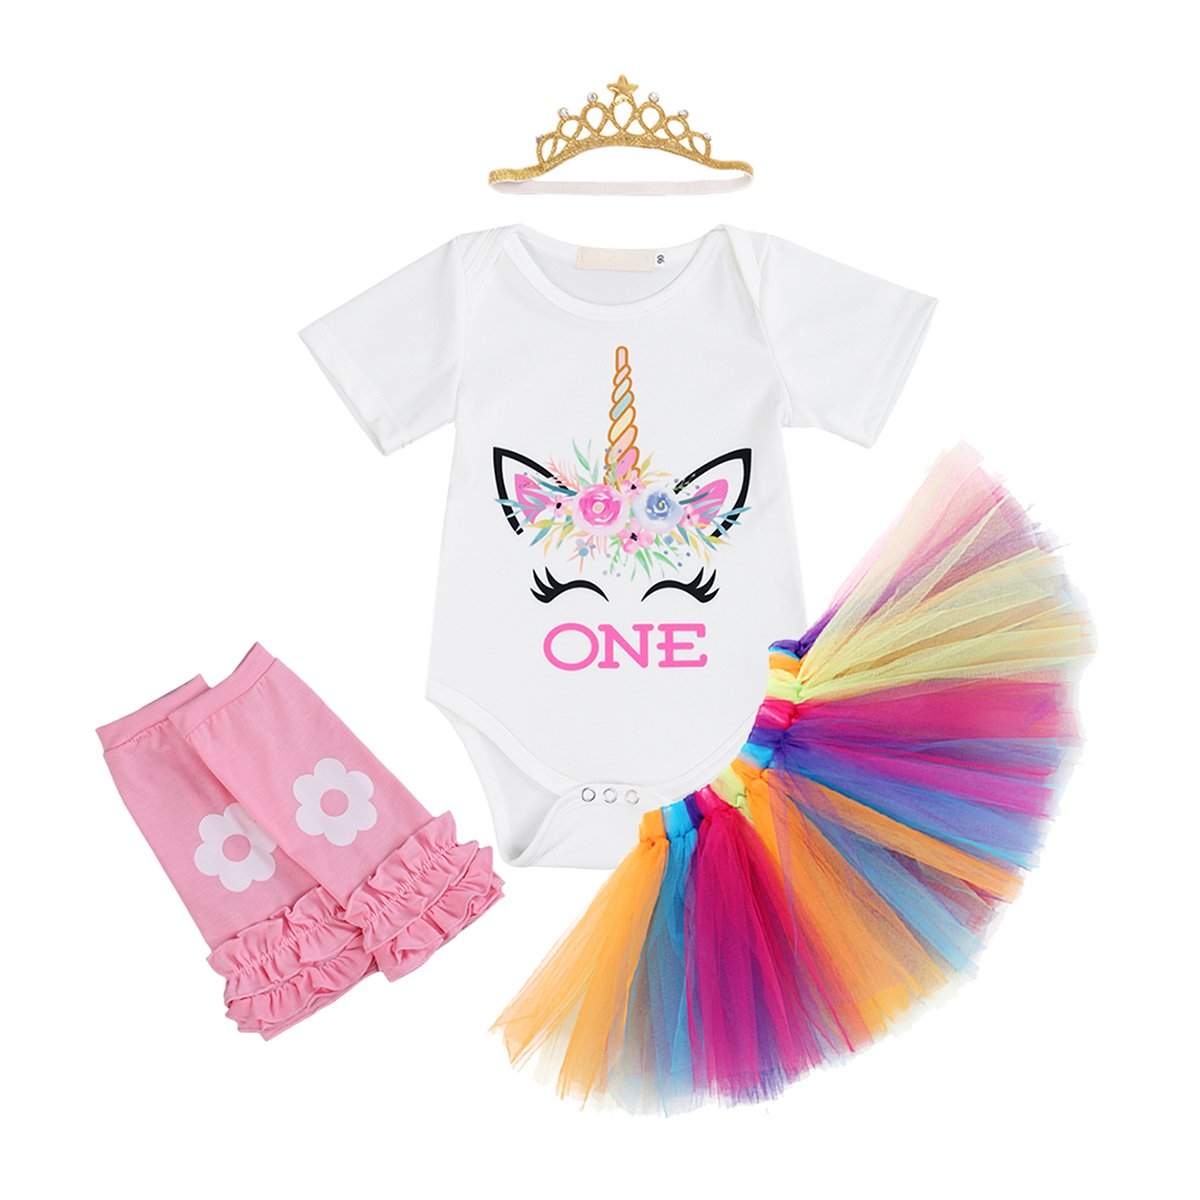 Girl Newborn It's My First Birthday Cartoon Costume Party Outfits Romper+Tutu Skirt+Flower Headband Dress Clothes Set